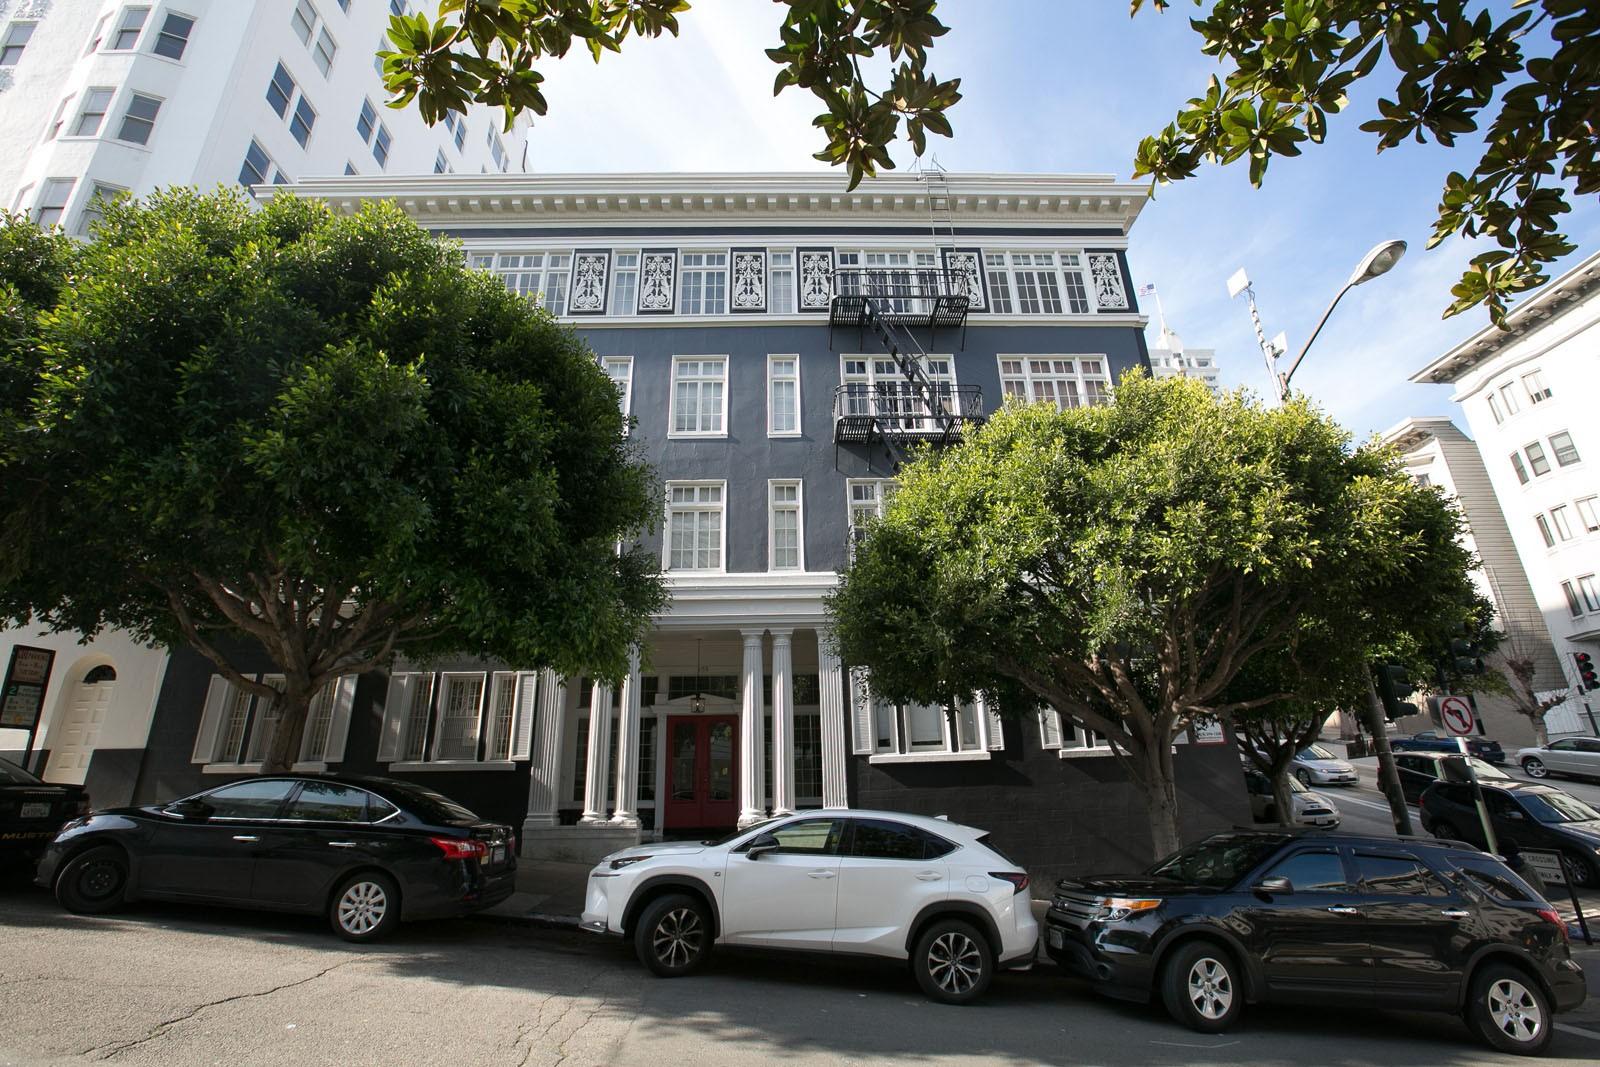 655 STOCKTON Apartments & Suites